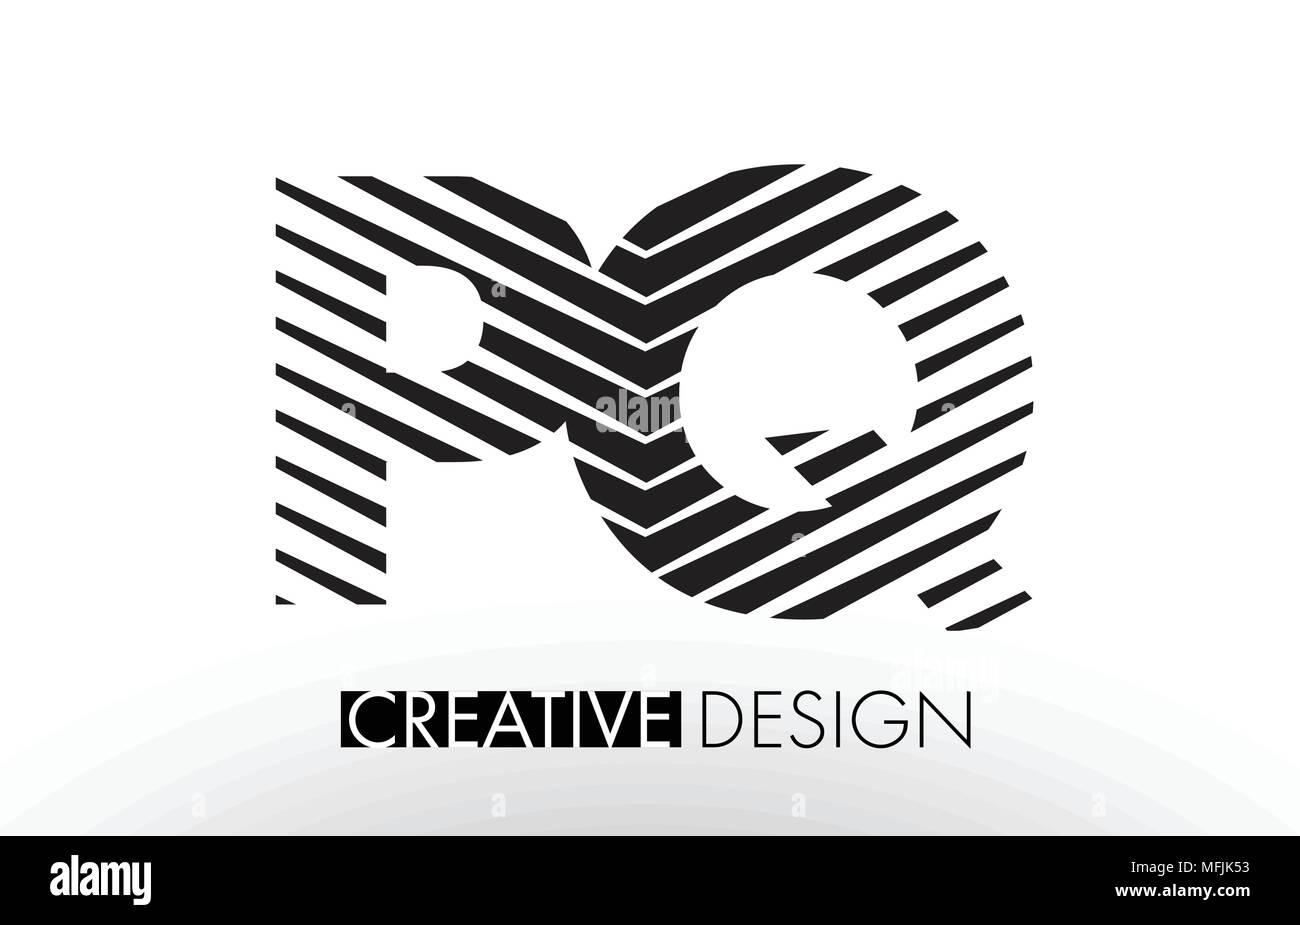 PQ P Q Lines Letter Design with Creative Elegant Zebra Vector Illustration. - Stock Image